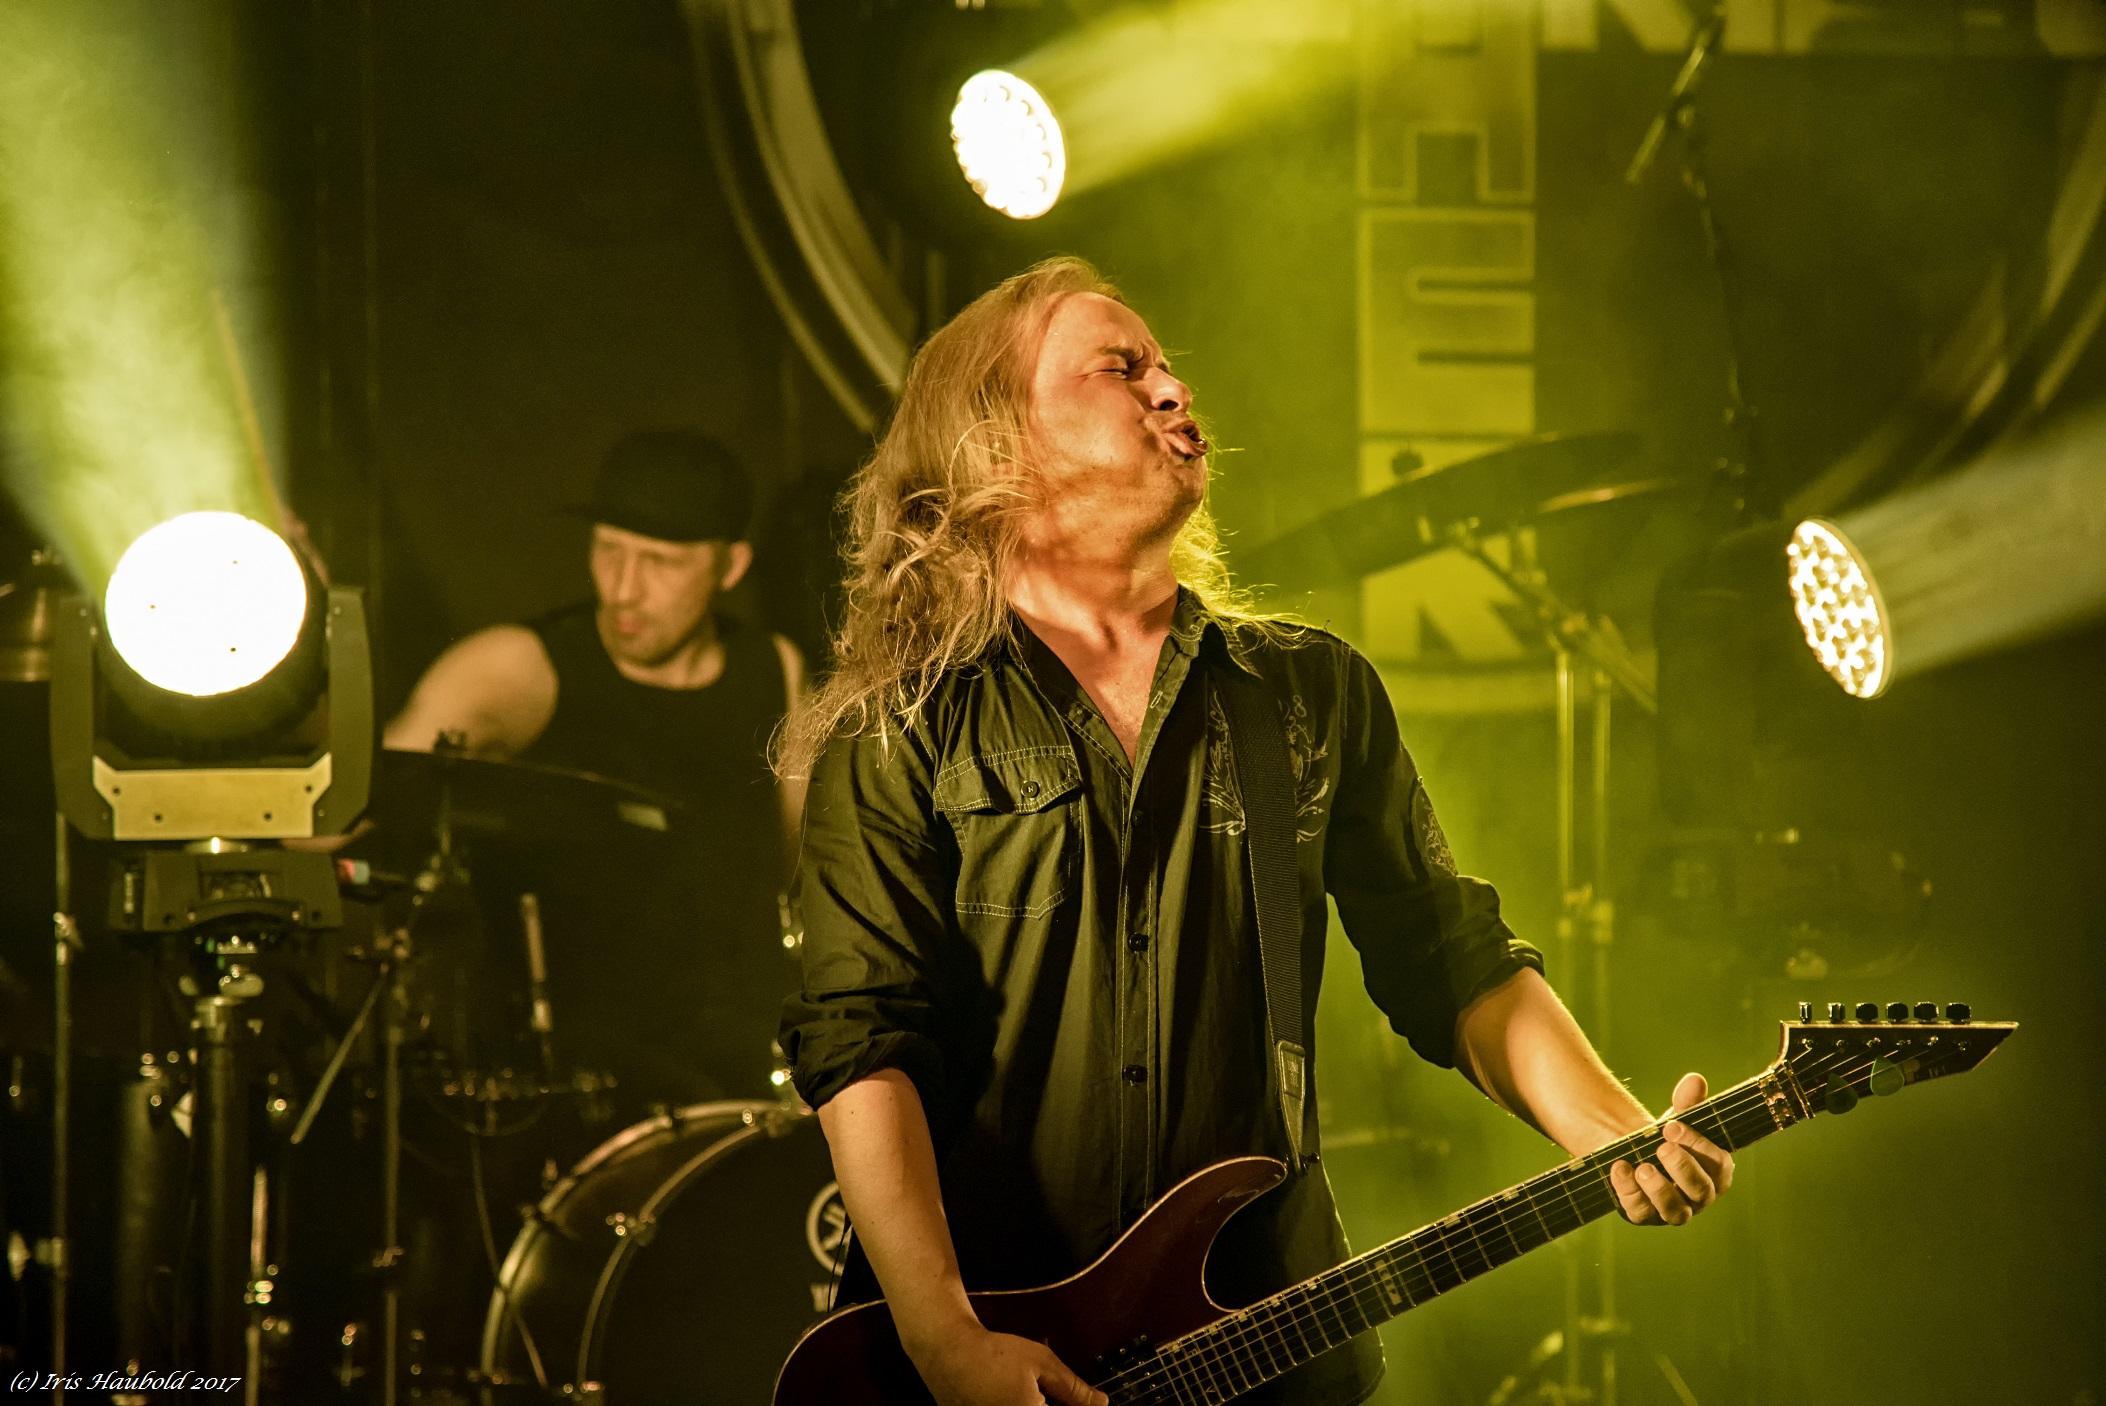 Brother Firetribe - Tavastia Helsinki 2017